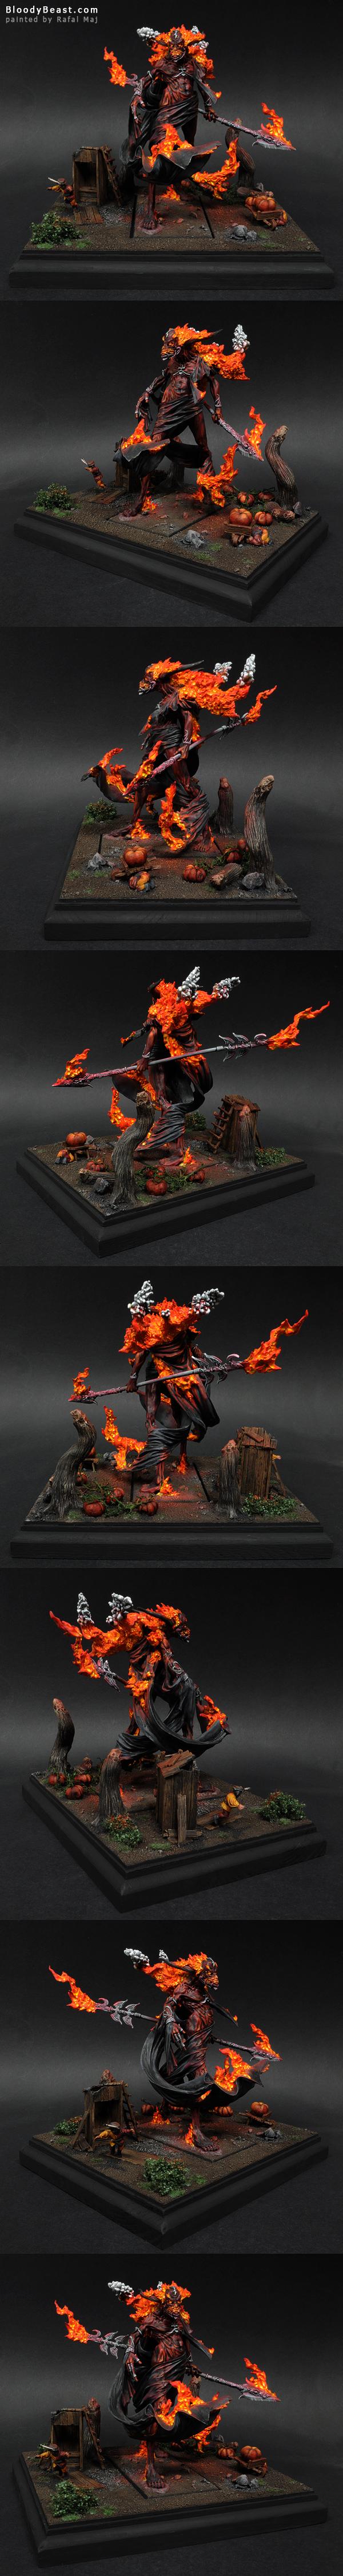 Incarnate Elemental Of Fire on Display Base painted by Rafal Maj (BloodyBeast.com)